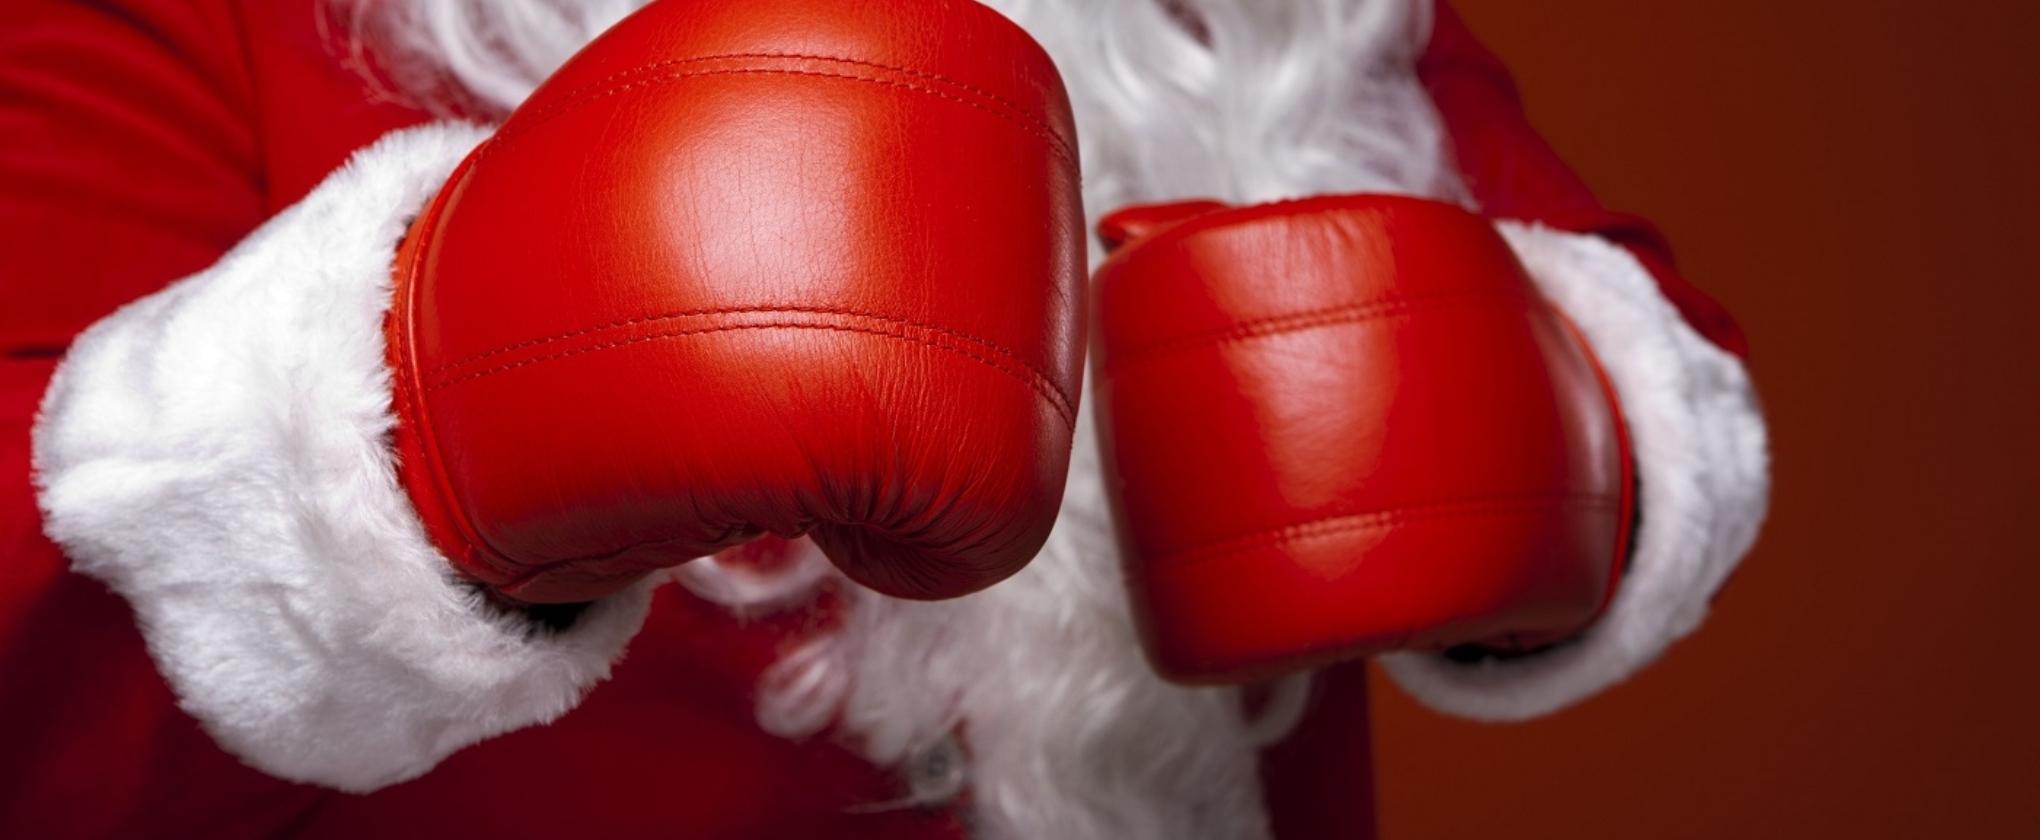 Santa: Master Burglar or Innocent House Guest?